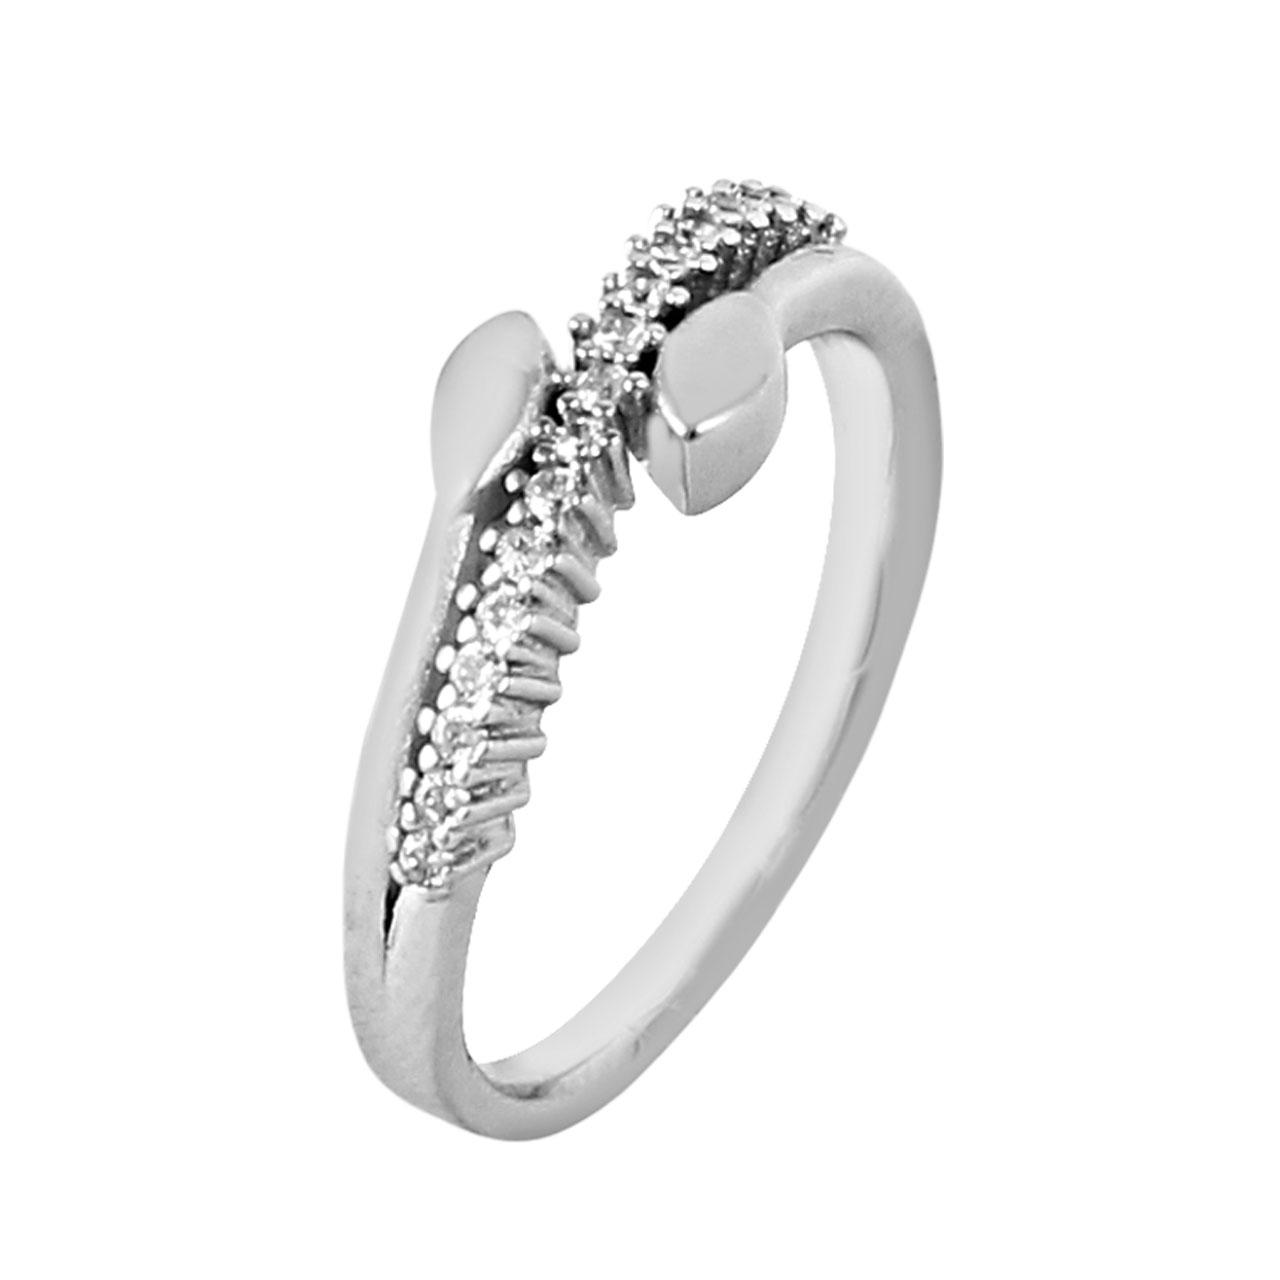 انگشتر نقره زنانه مد و کلاس کد 1000499-7